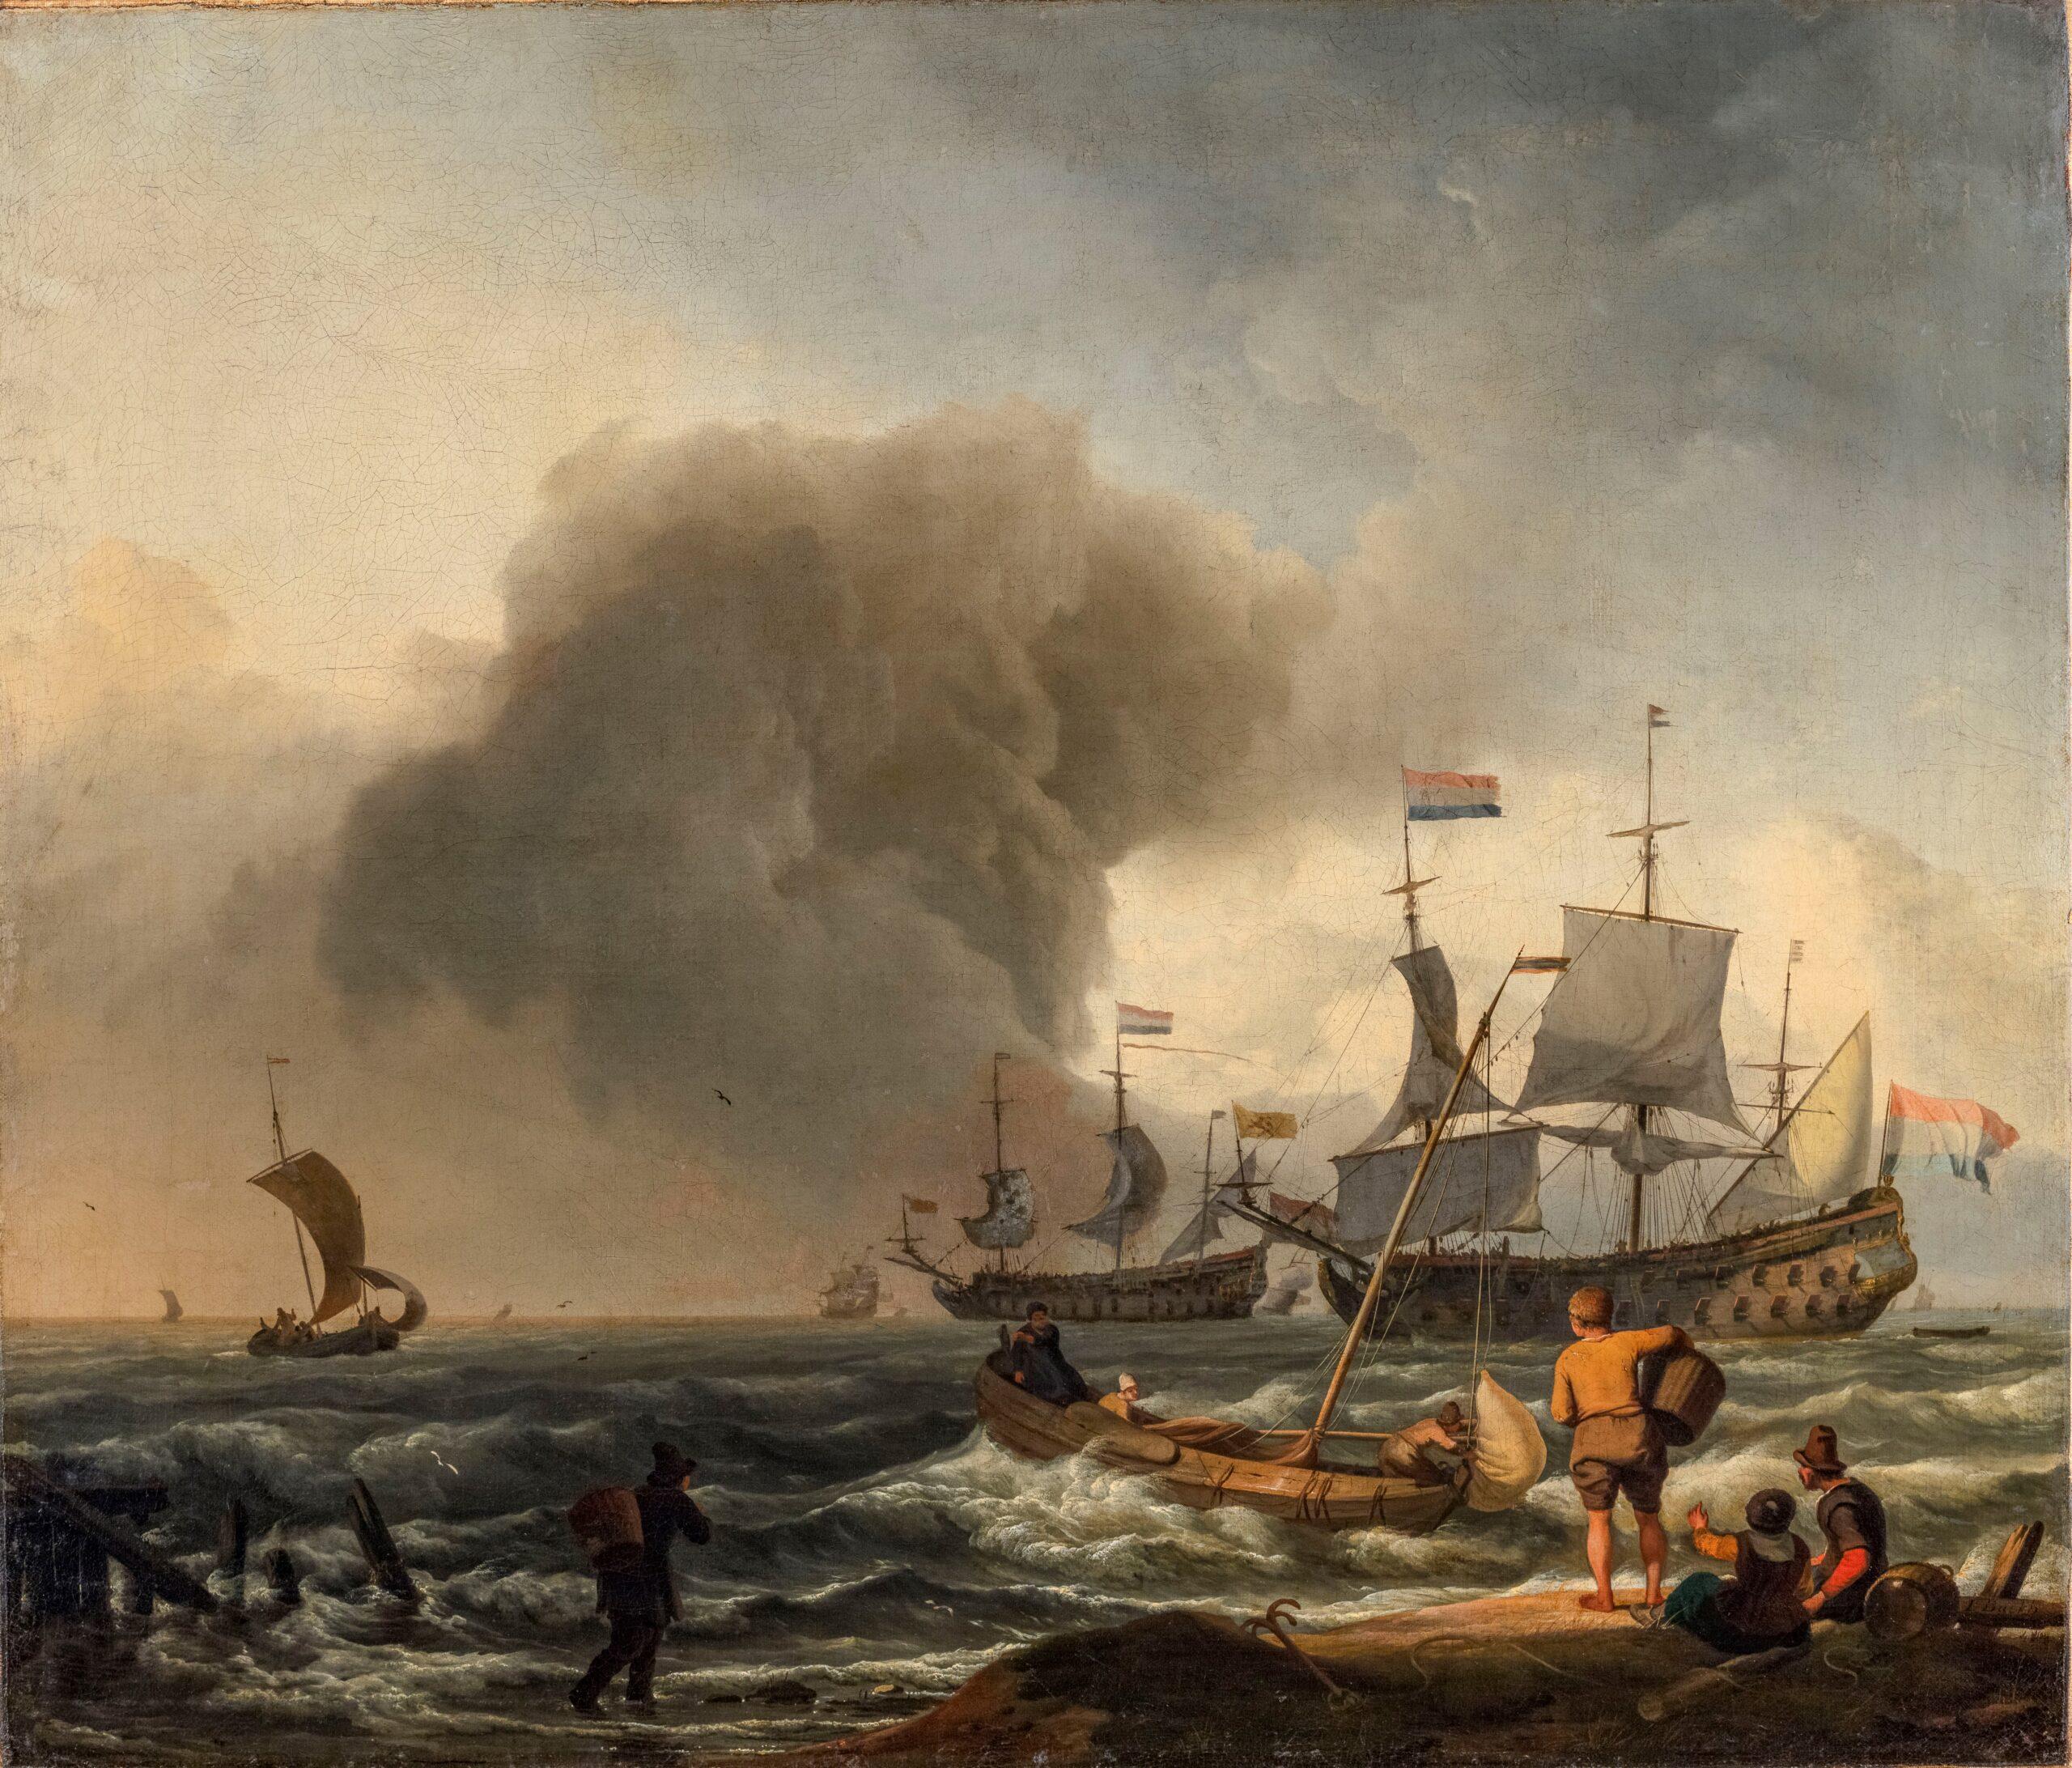 Fig. 4 Ludolf Backhuysen (1630/31–1708), Seascape with Fishing Boats and Warships, c. 1670Kurpfälzisches Museum der Stadt Heidelberg. Photo: K. Gattner